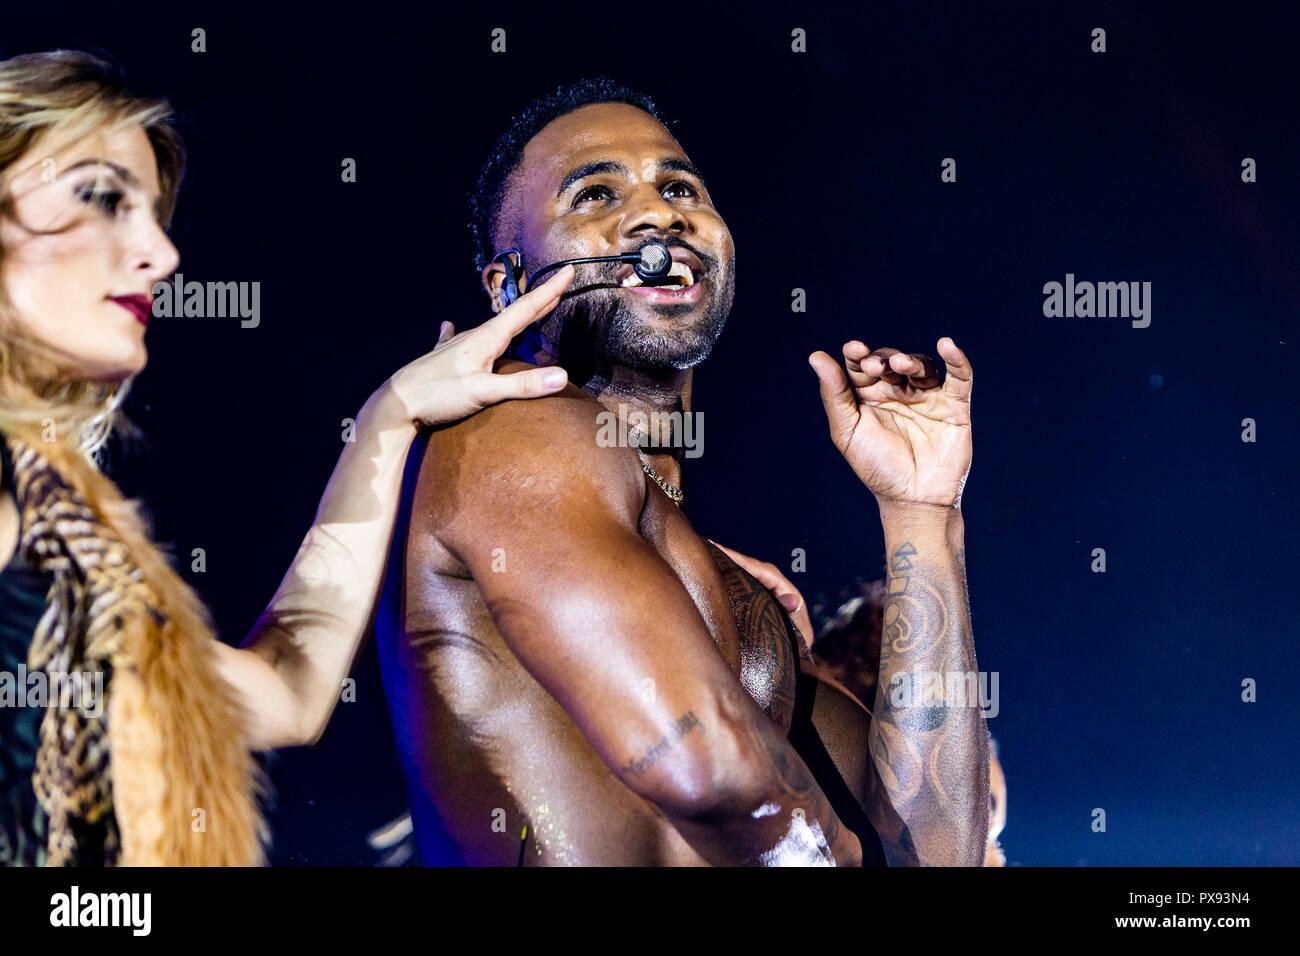 Jason Derulo Stock Photos & Jason Derulo Stock Images - Alamy